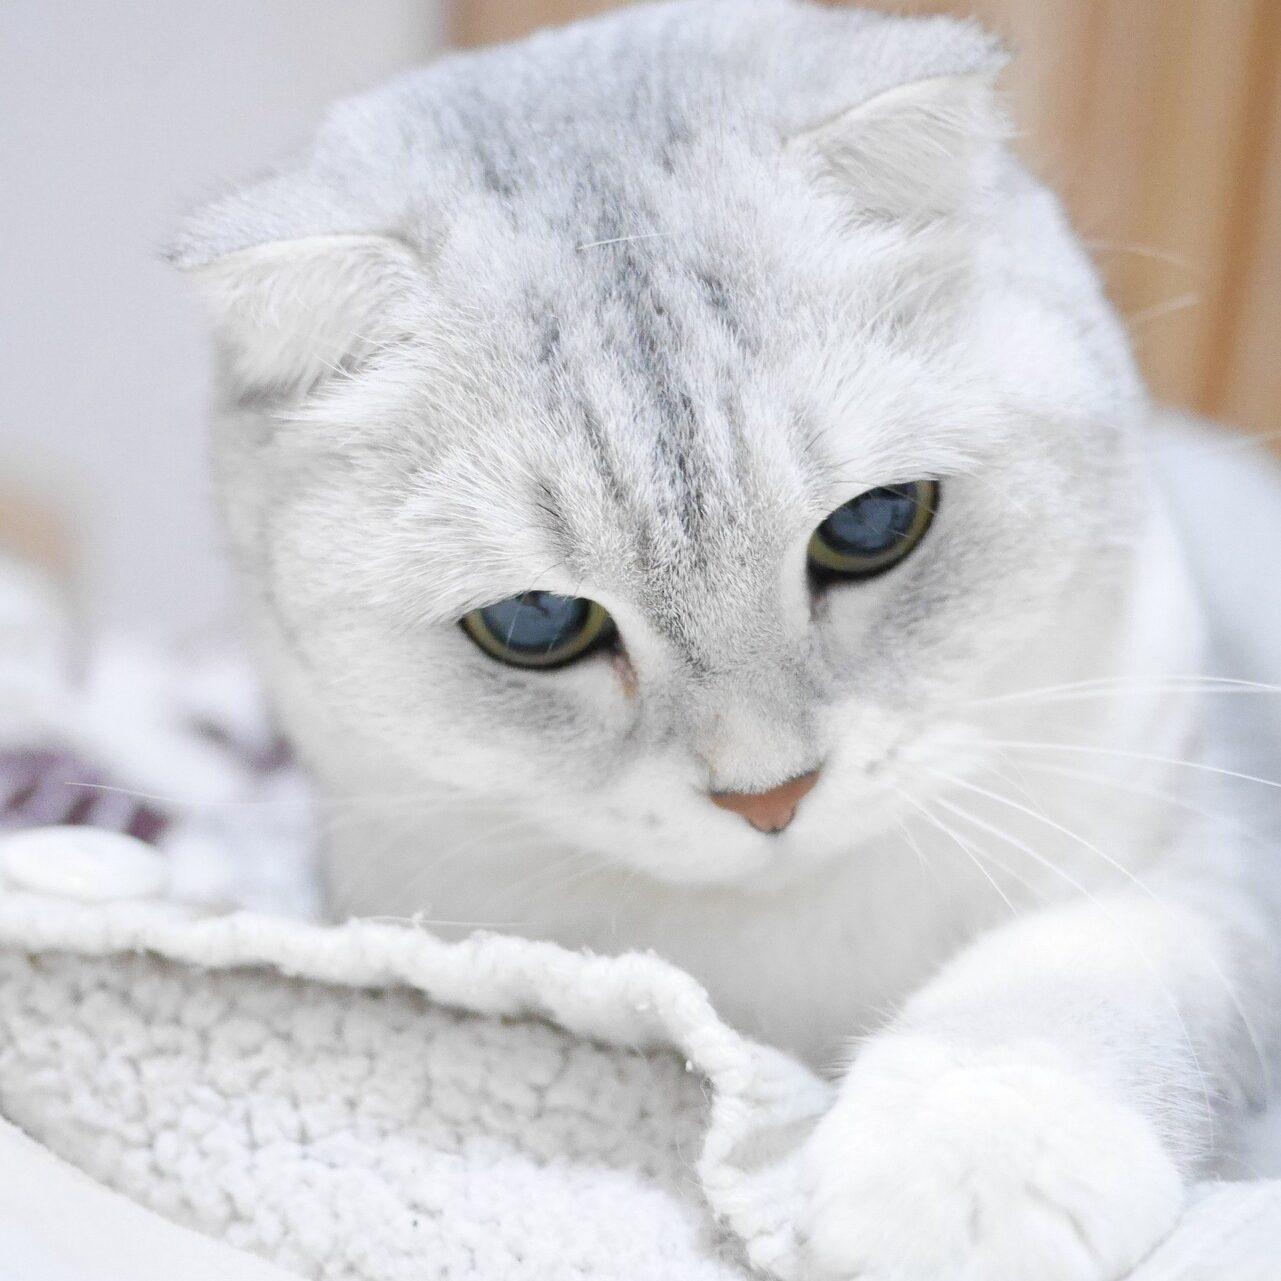 scottish-fold-cats-1073667_1920